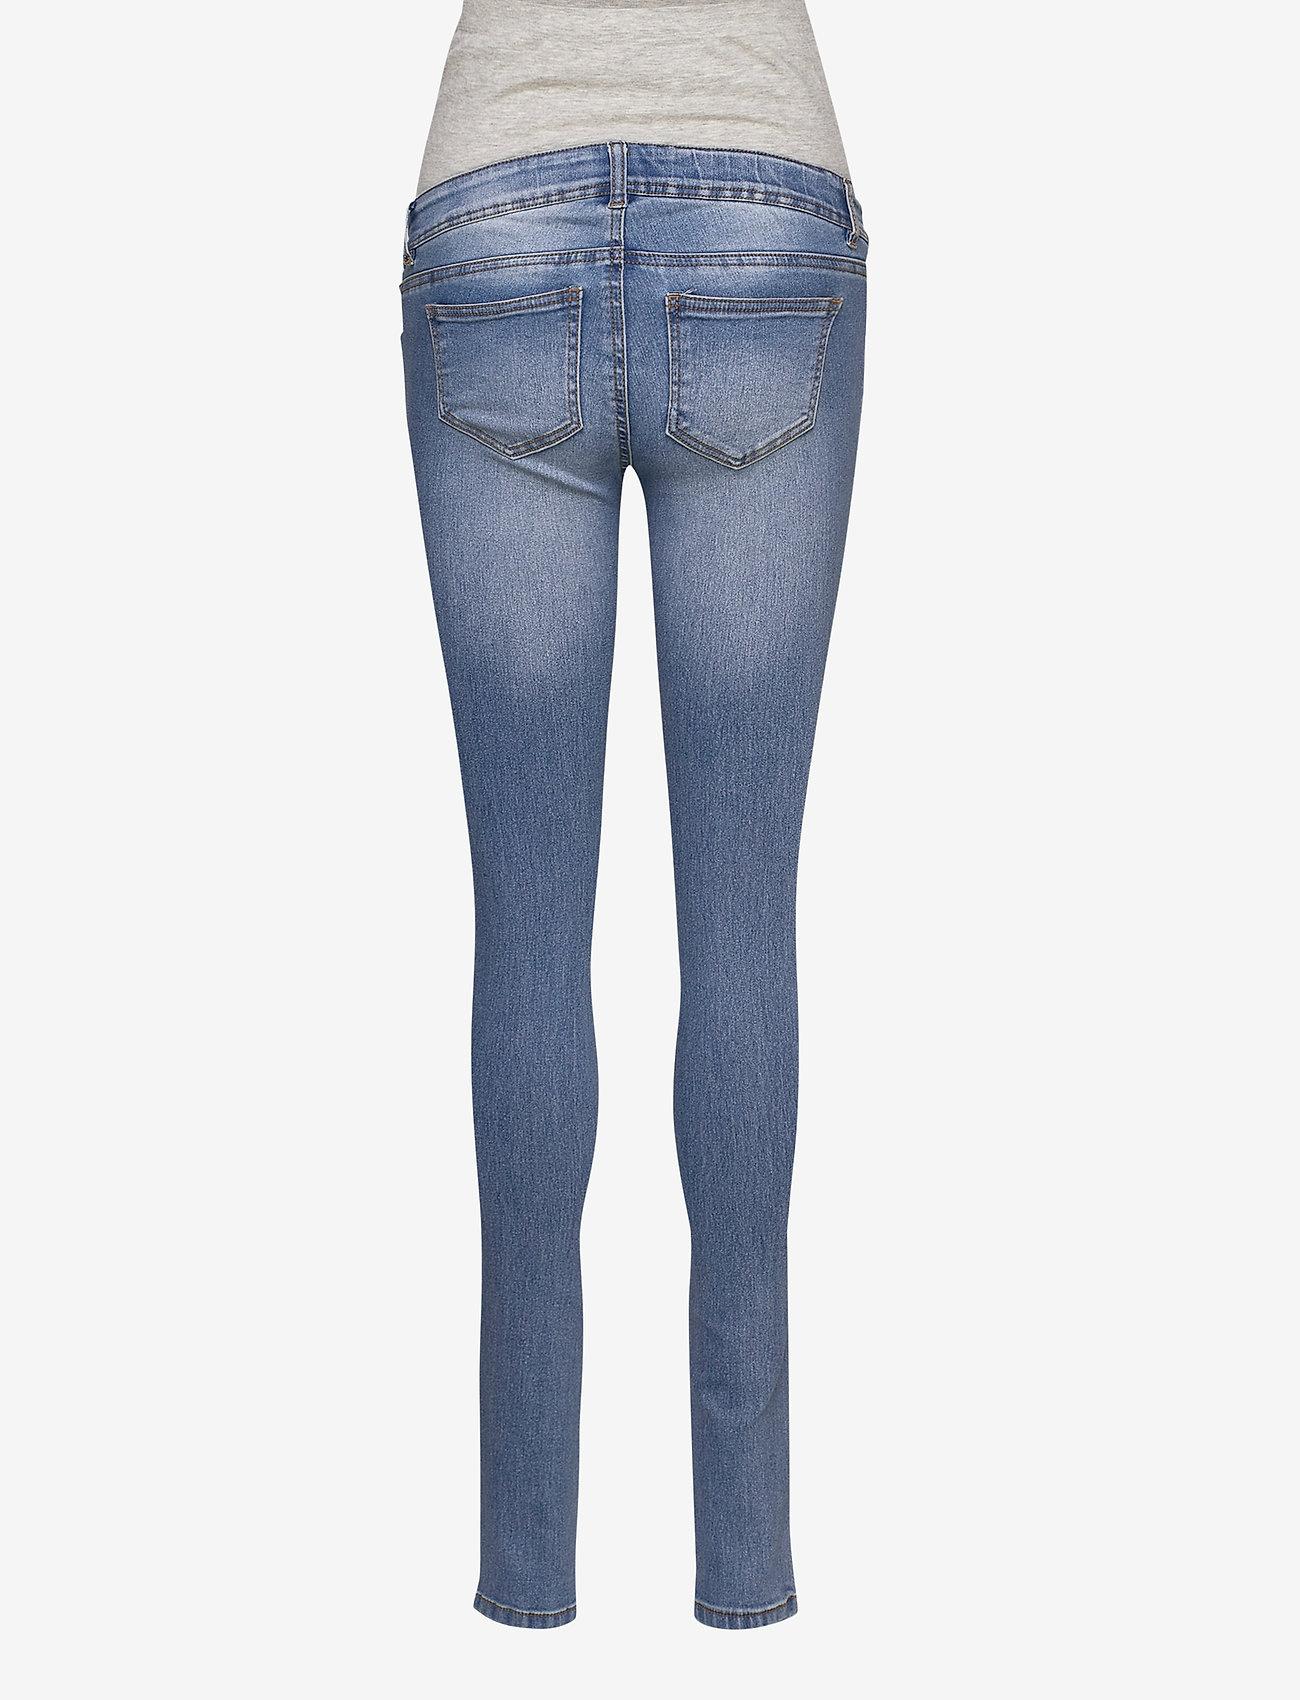 Mamalicious - MLONO SLIM JEANS - slim jeans - light blue denim - 1